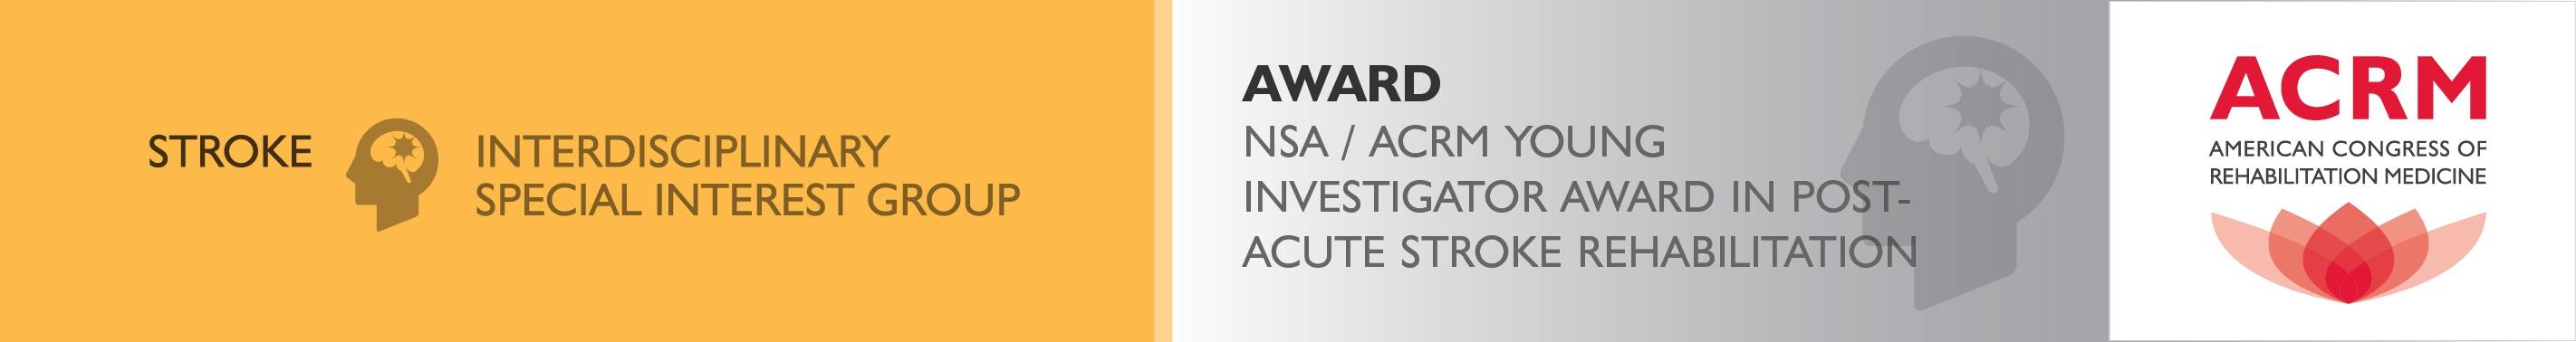 NSA-ACRM Young Investigators Award in Post-Acute Stroke Rehabilitation